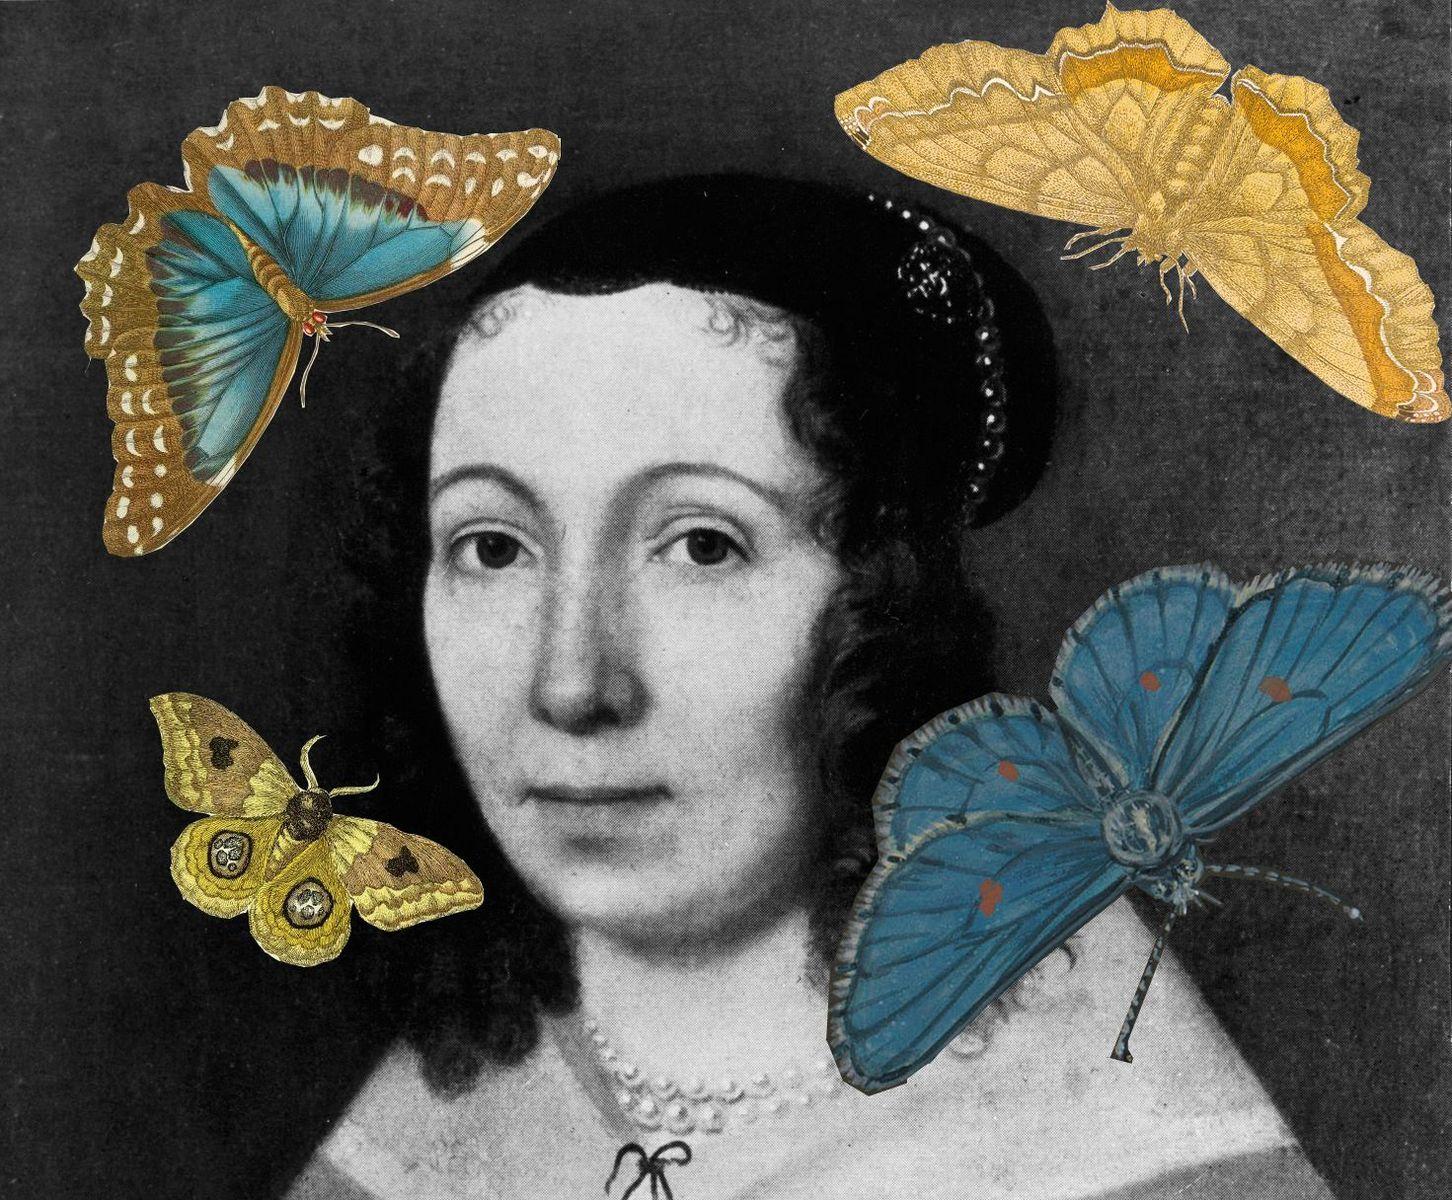 Maria Sibylla Merian, Portrait, Gemälde (o.J.) (Collage), © bpk